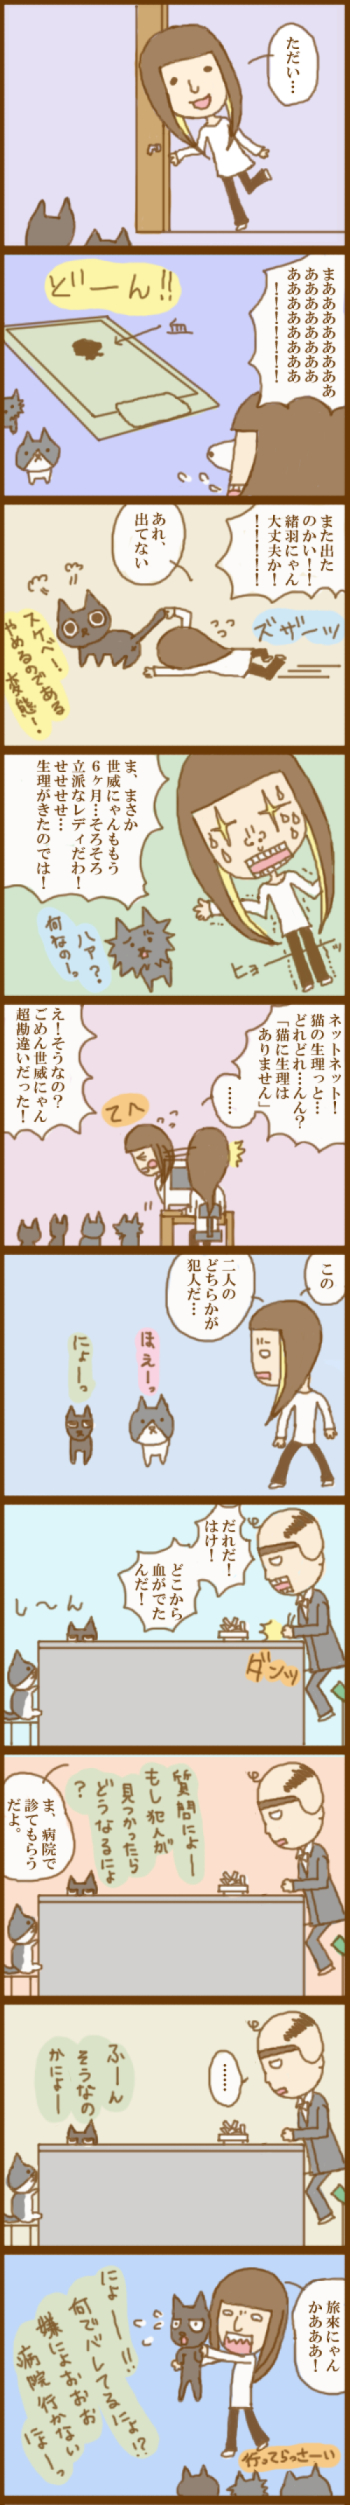 f:id:suzuokayu:20201114180249j:plain